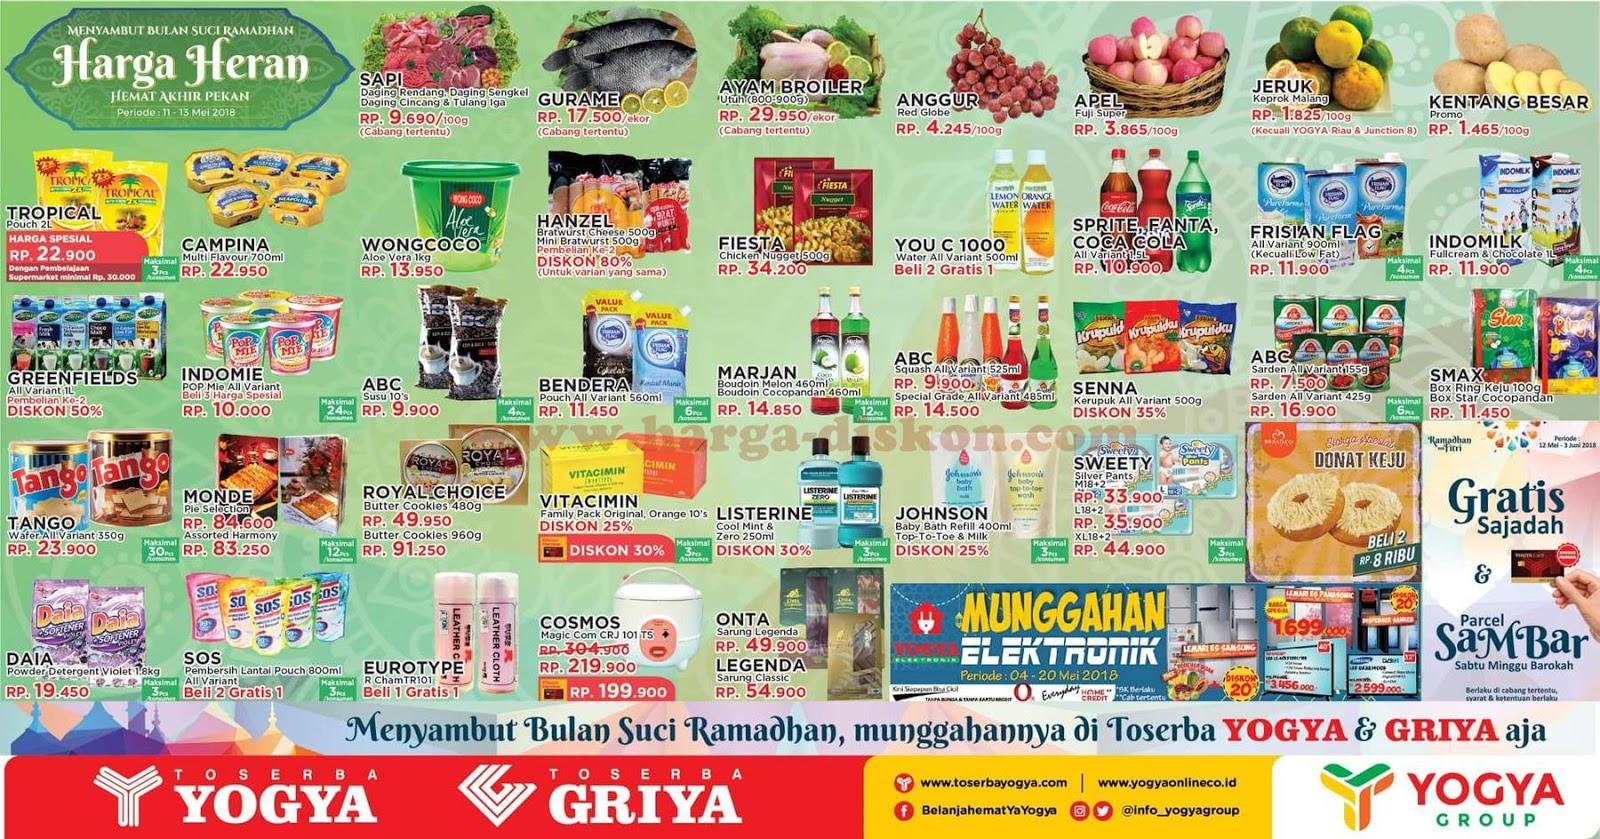 Katalog Harga Toserba Yogya Promo Jsm Akhir Pekan 11 13 Mei 2018 News And Talking